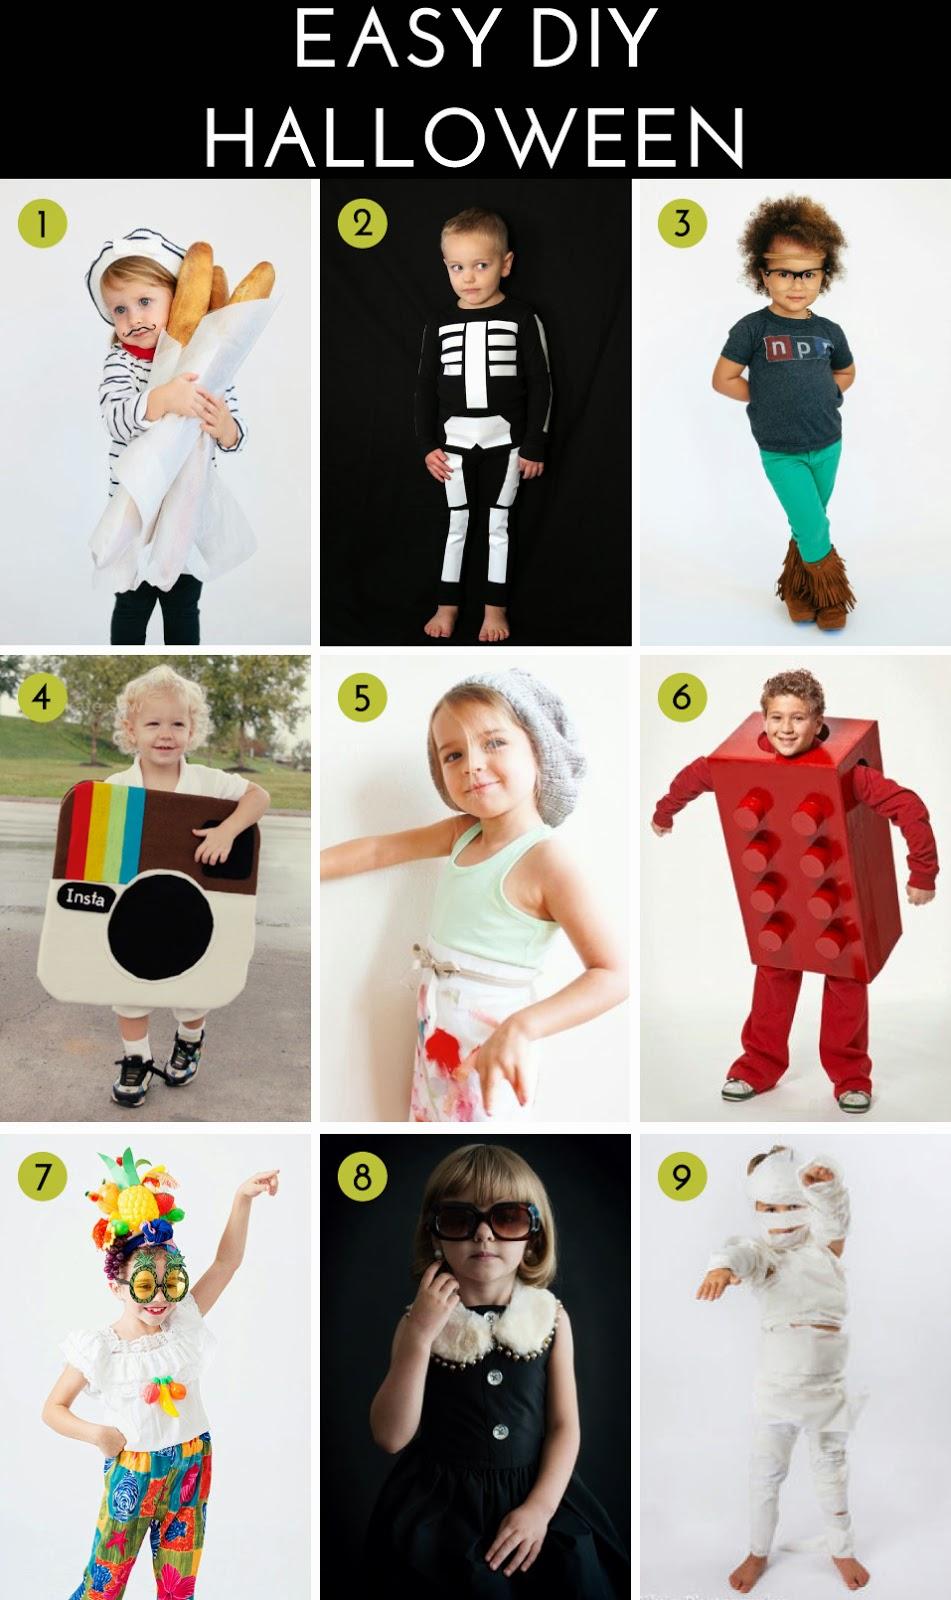 Not-So-SAHM: Easy DIY Halloween Costumes